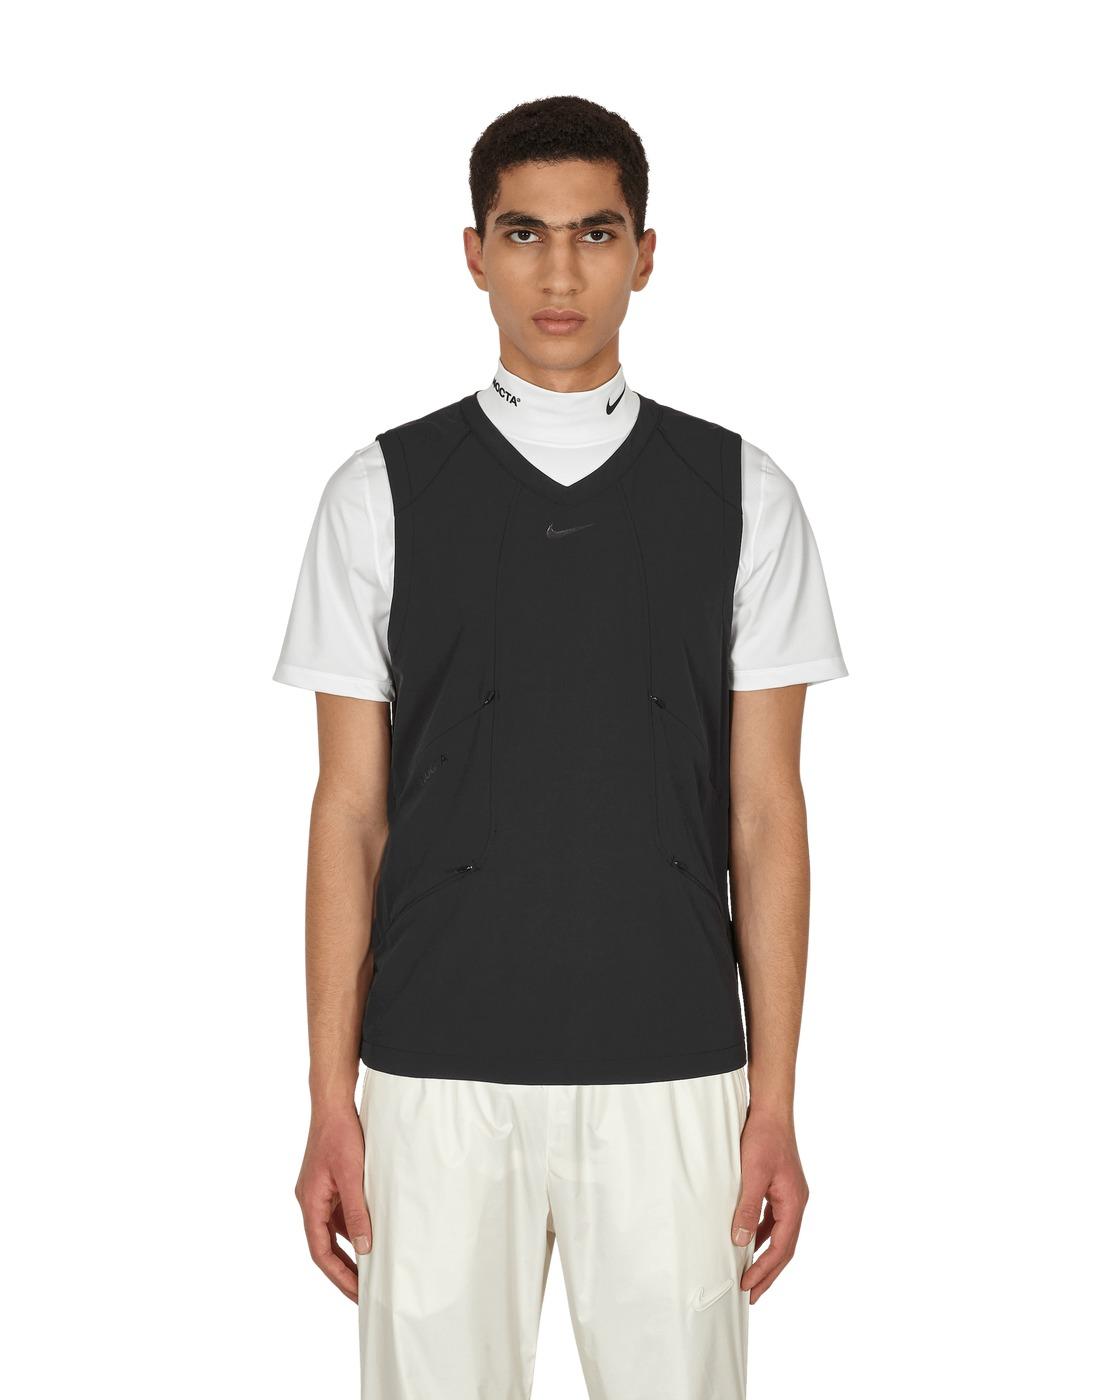 Photo: Nike Special Project Nocta Woven Vest Black